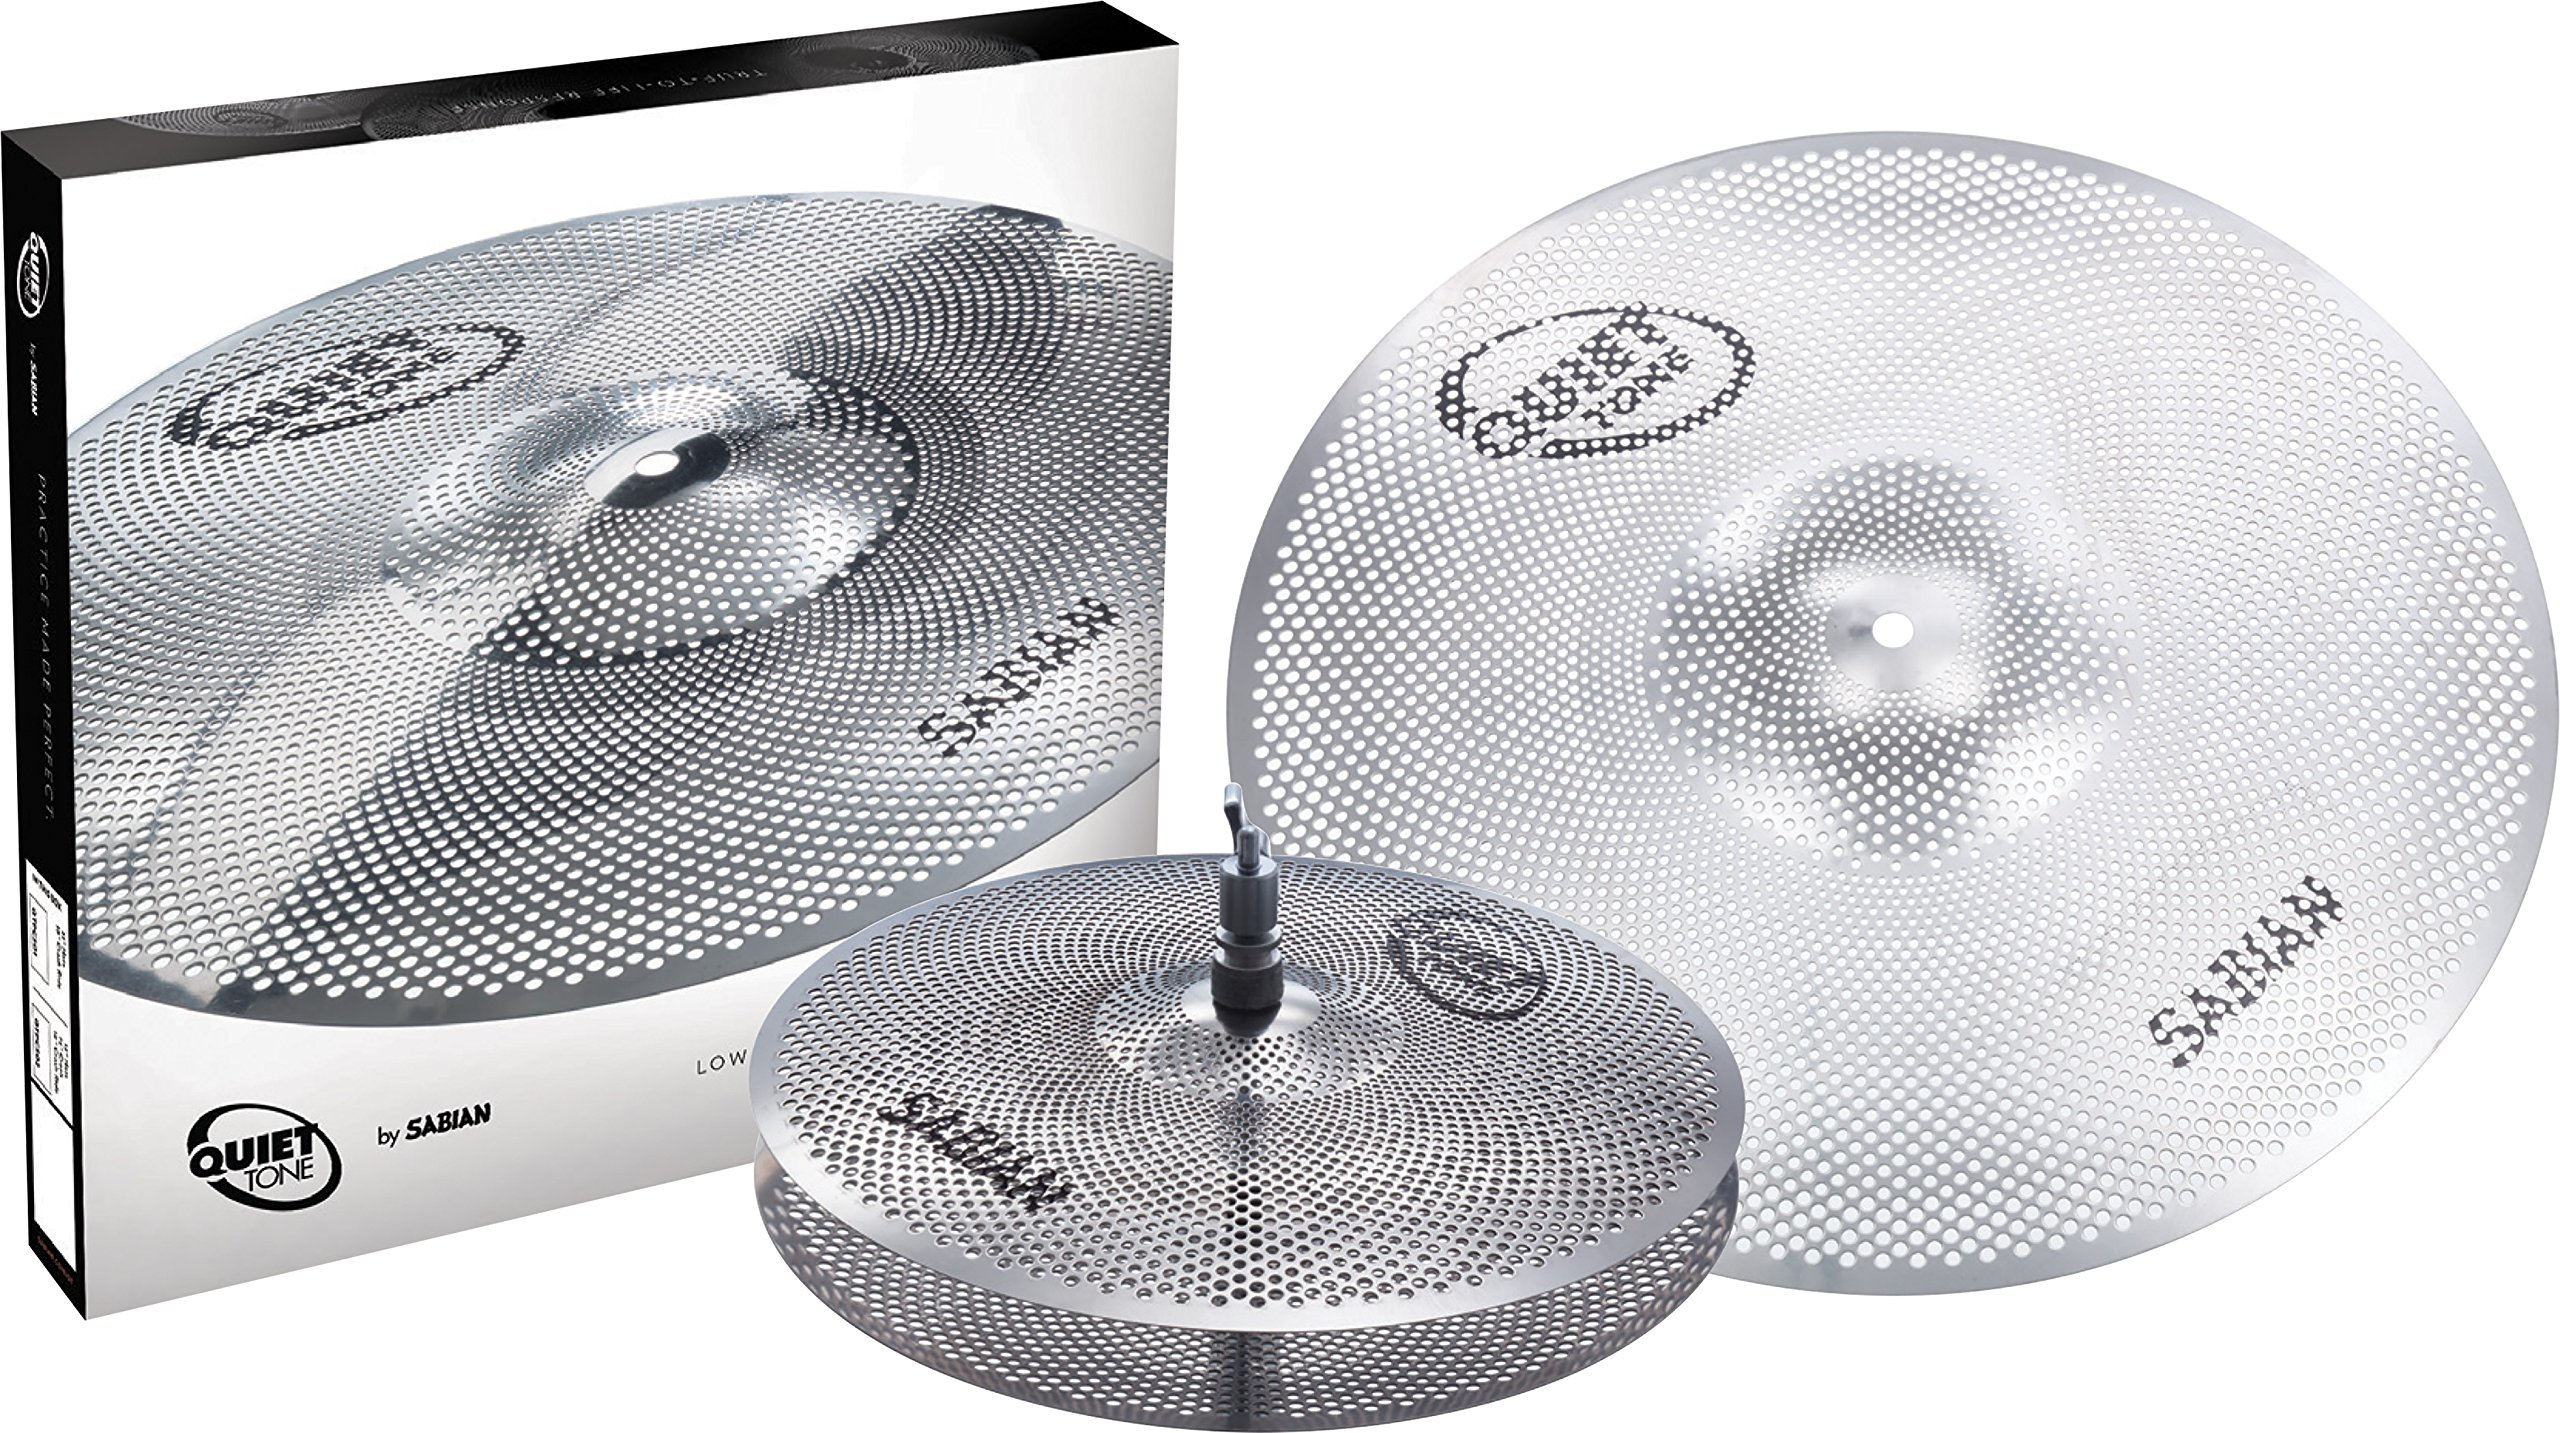 Sabian QTPC501 Quiet Tone Practice Cymbal Set -Silver- 13''/18'' (QTPC501) by Sabian